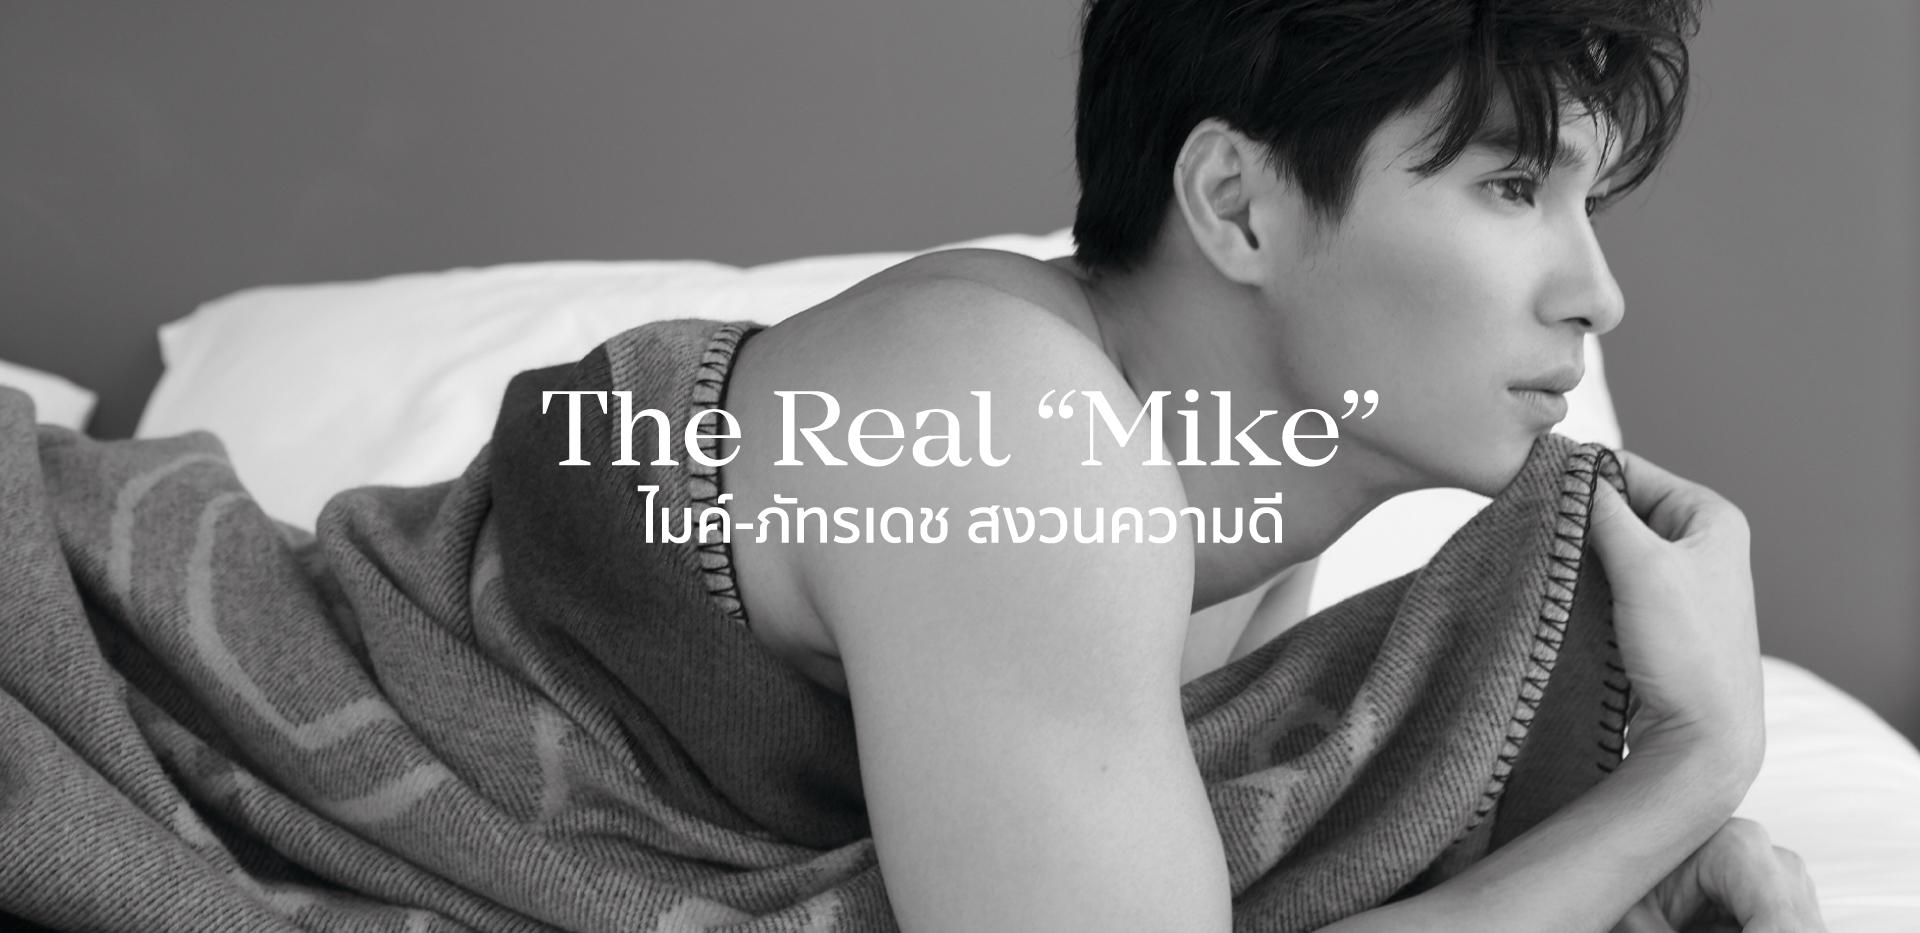 "The Real ""Mike"" ไมค์-ภัทรเดช สงวนความดี"